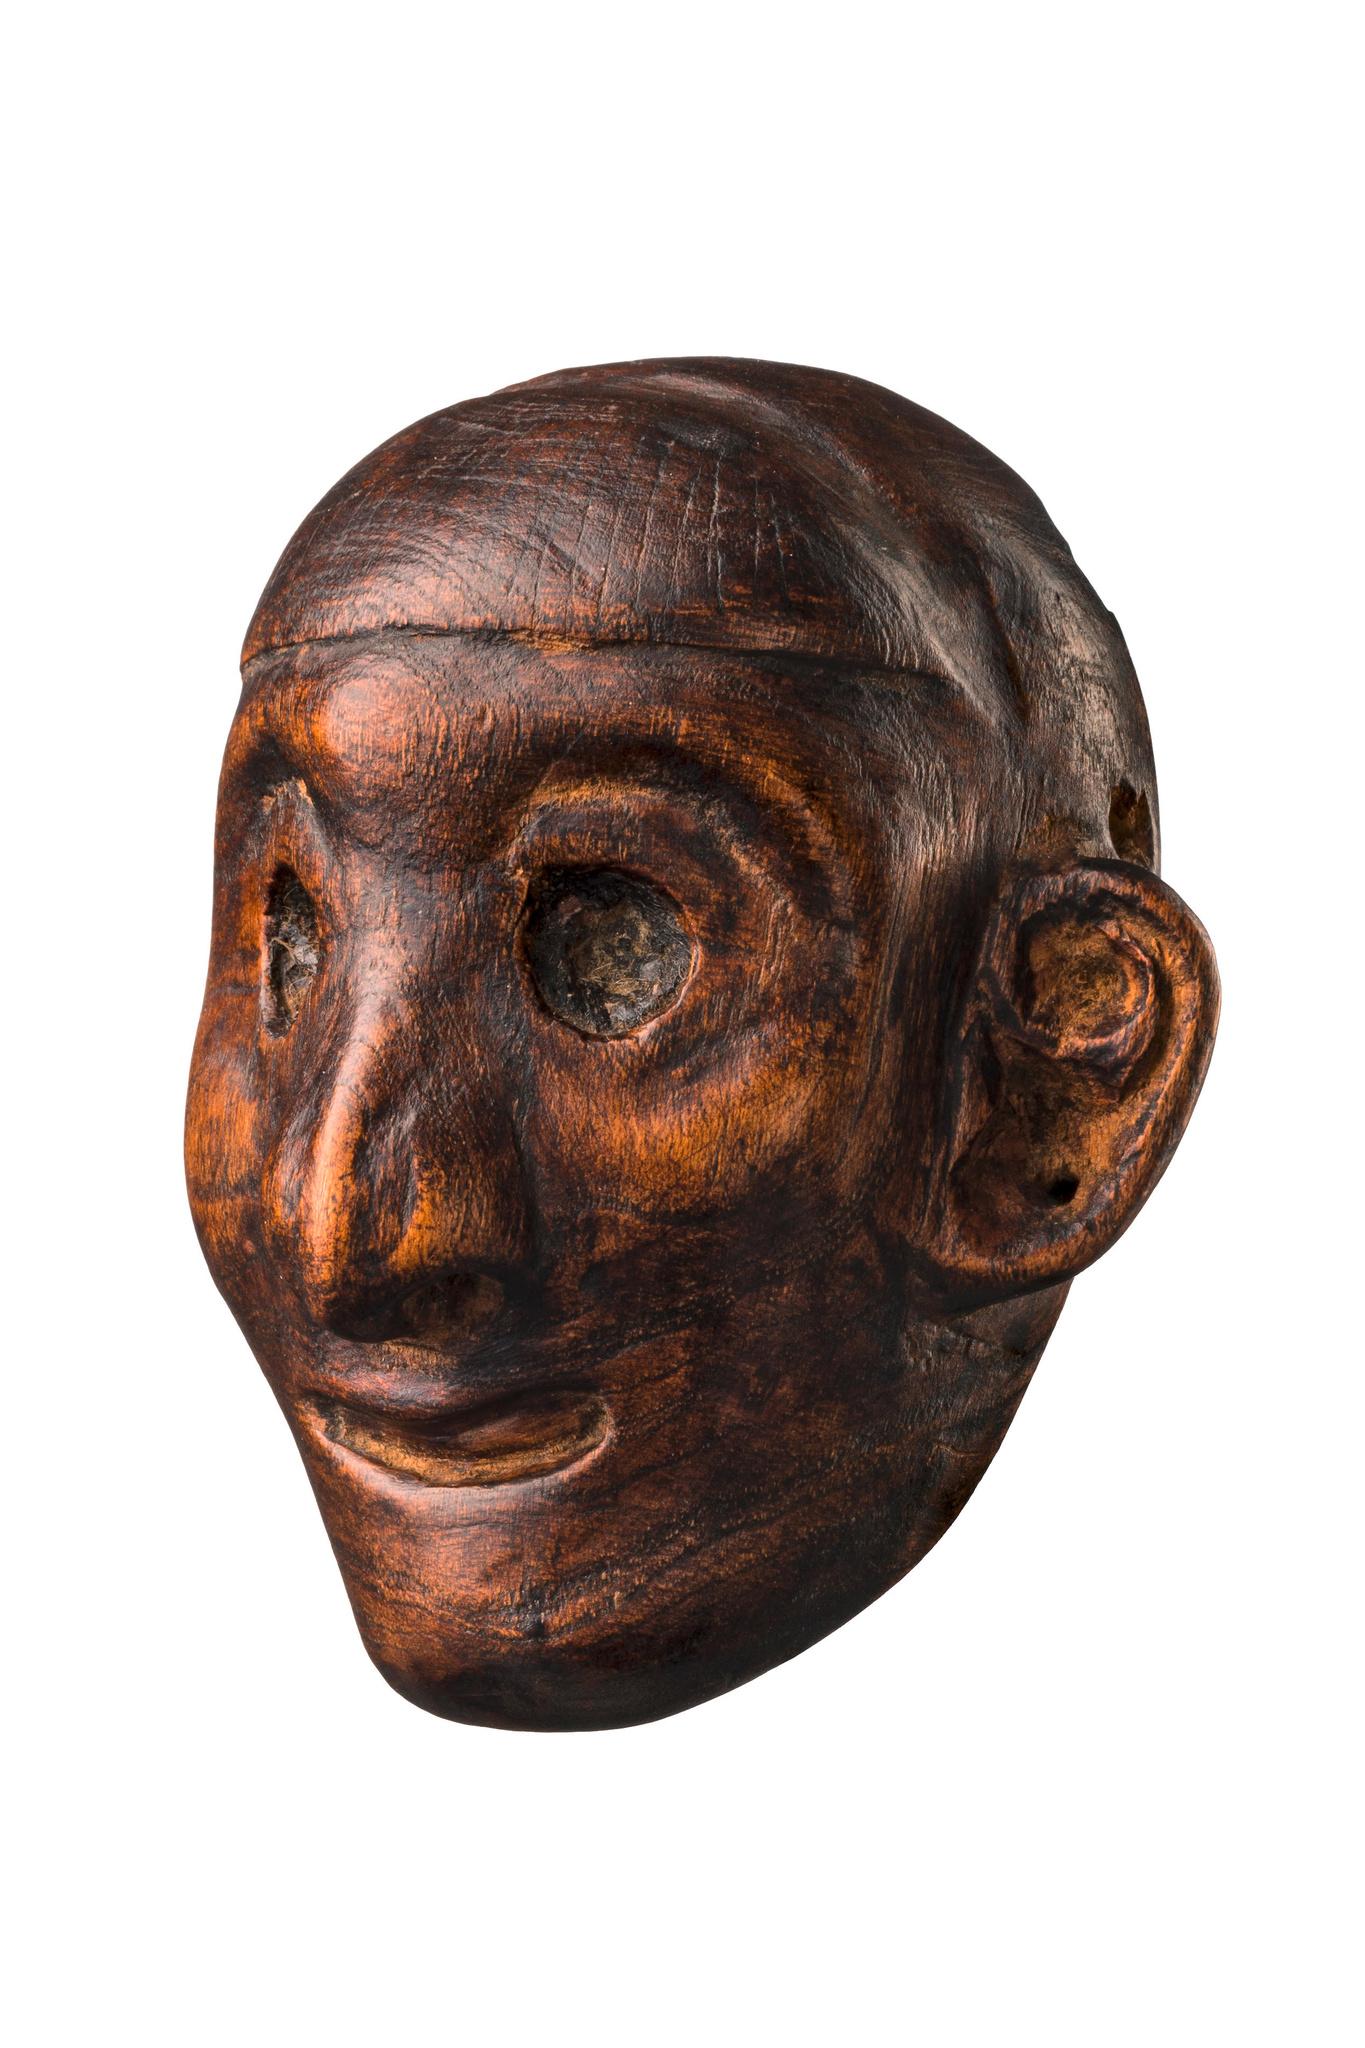 Headhunter's chest ornament